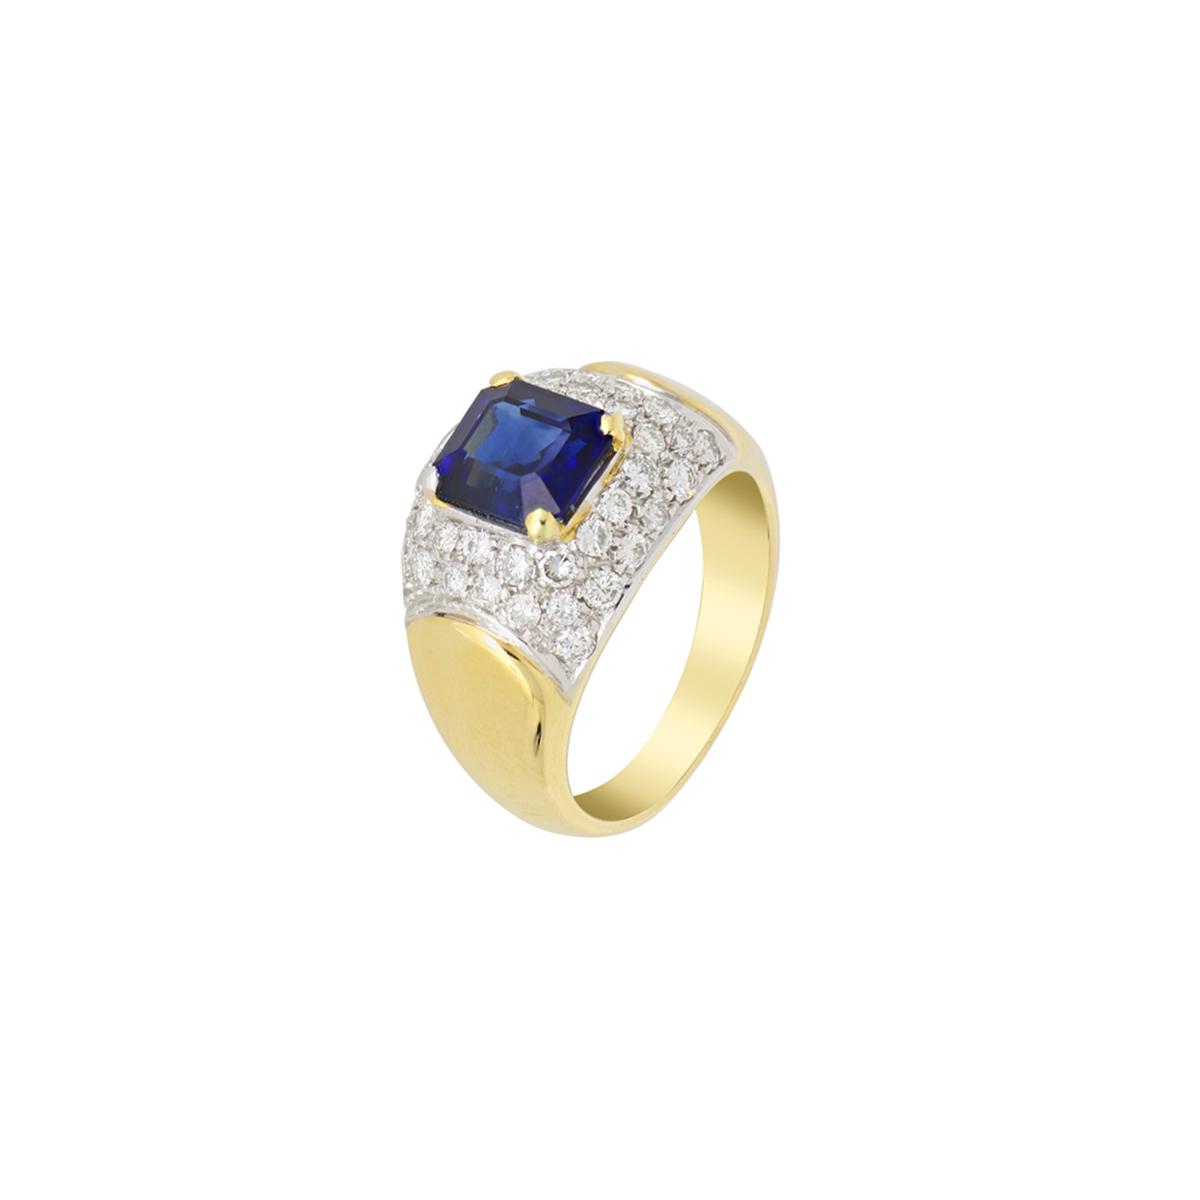 Octagon-Cut Sapphire Ring with Diamonds